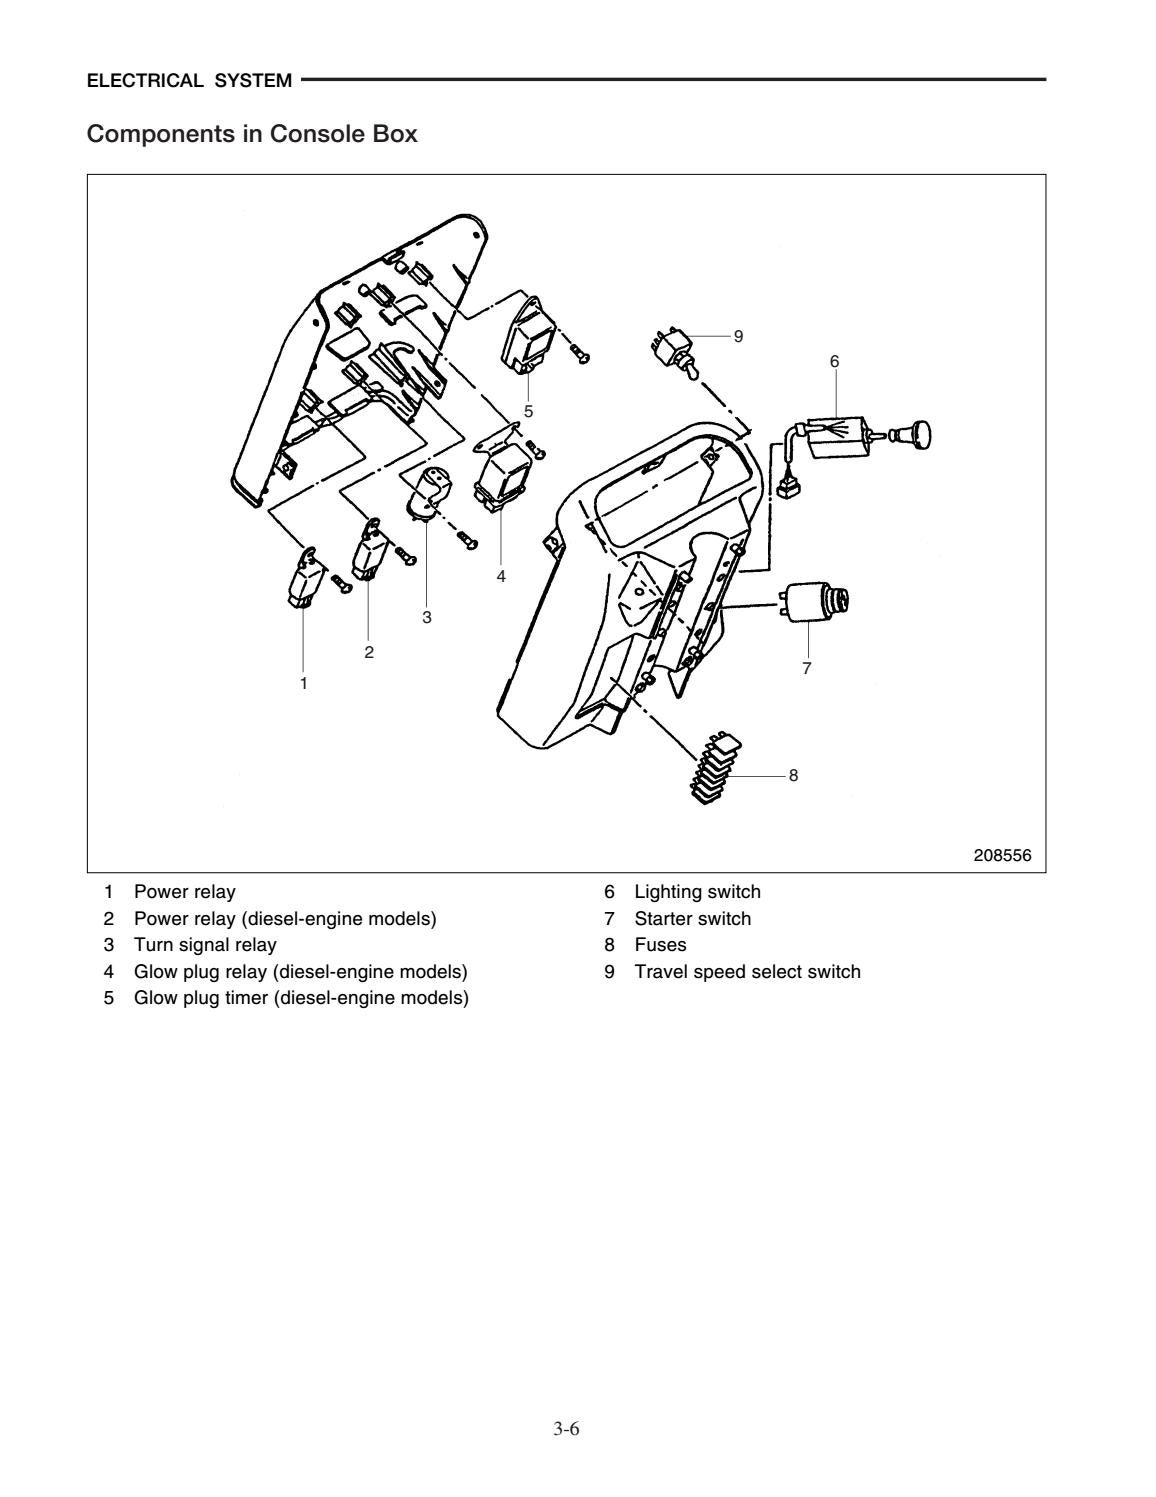 6 5 diesel glow plug wiring diagram caterpillar cat dp50k forklift lift trucks chassis and mast  caterpillar cat dp50k forklift lift